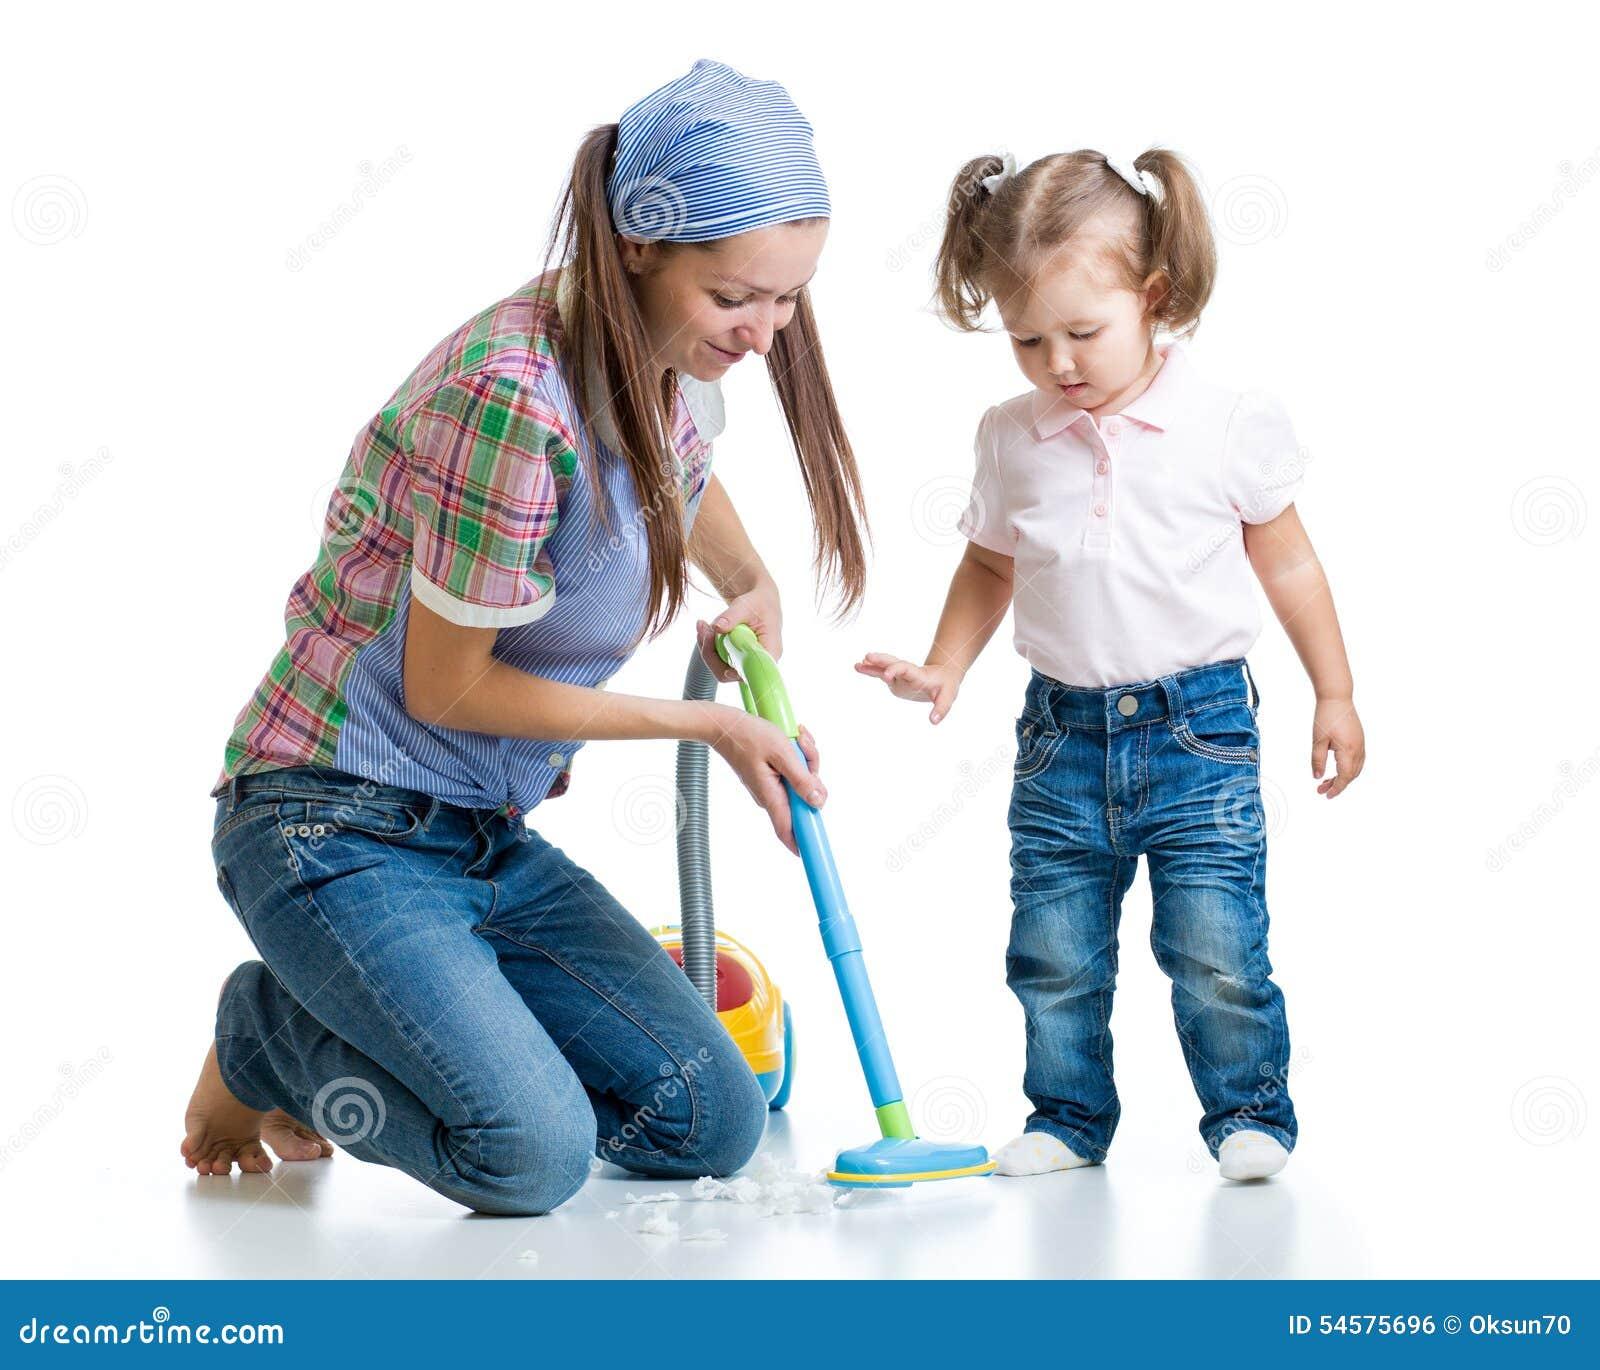 how to clean uncircumcised child